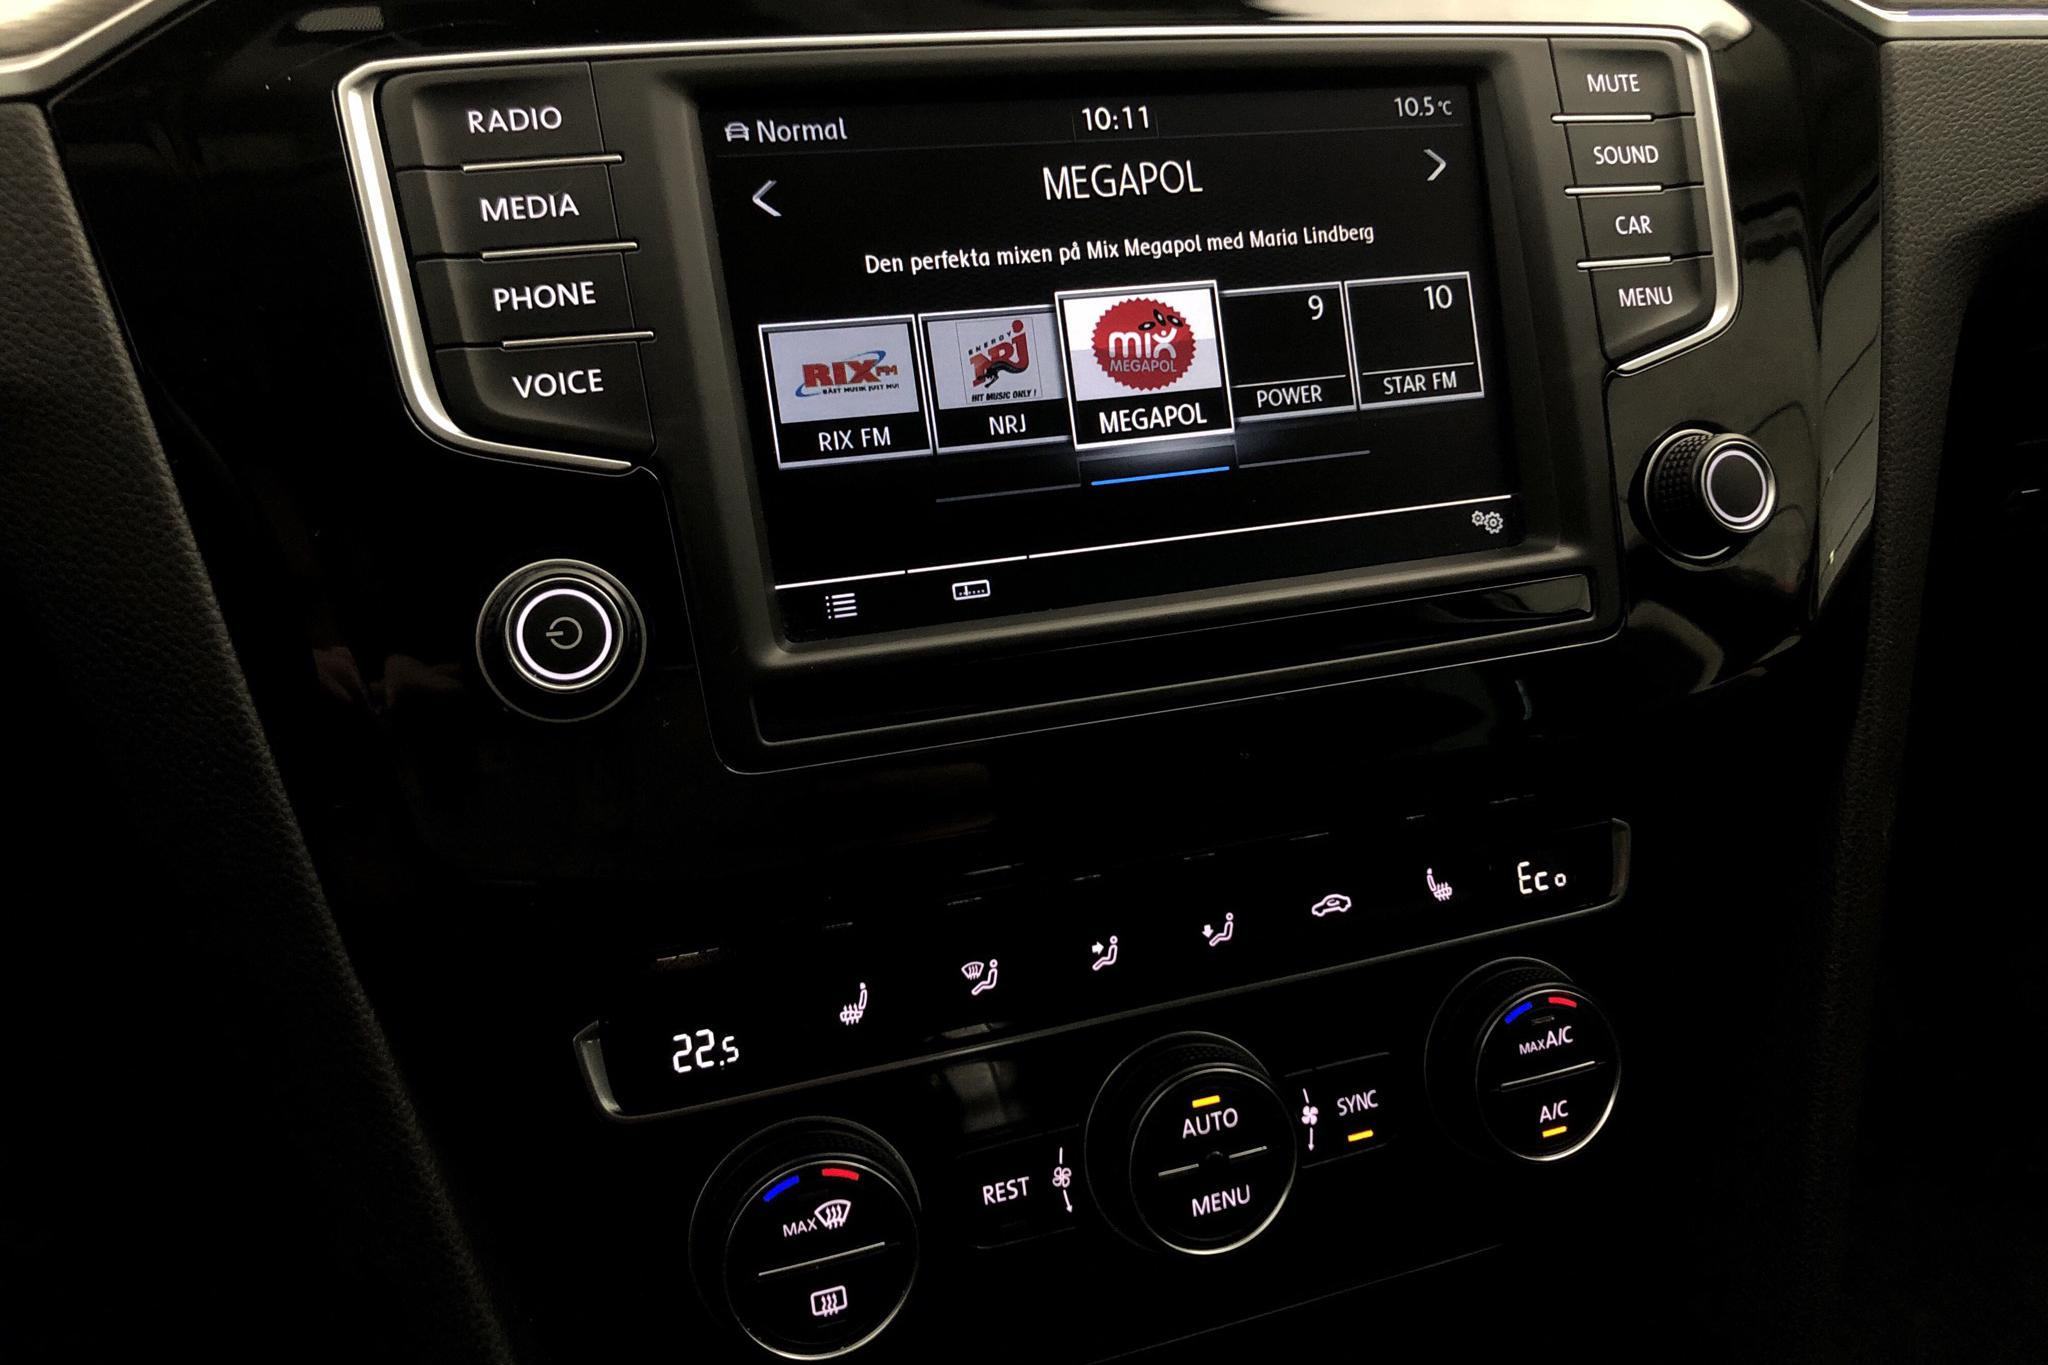 VW Passat 1.4 Plug-in-Hybrid Sportscombi (218hk) - 12 995 mil - Automat - Dark Grey - 2017